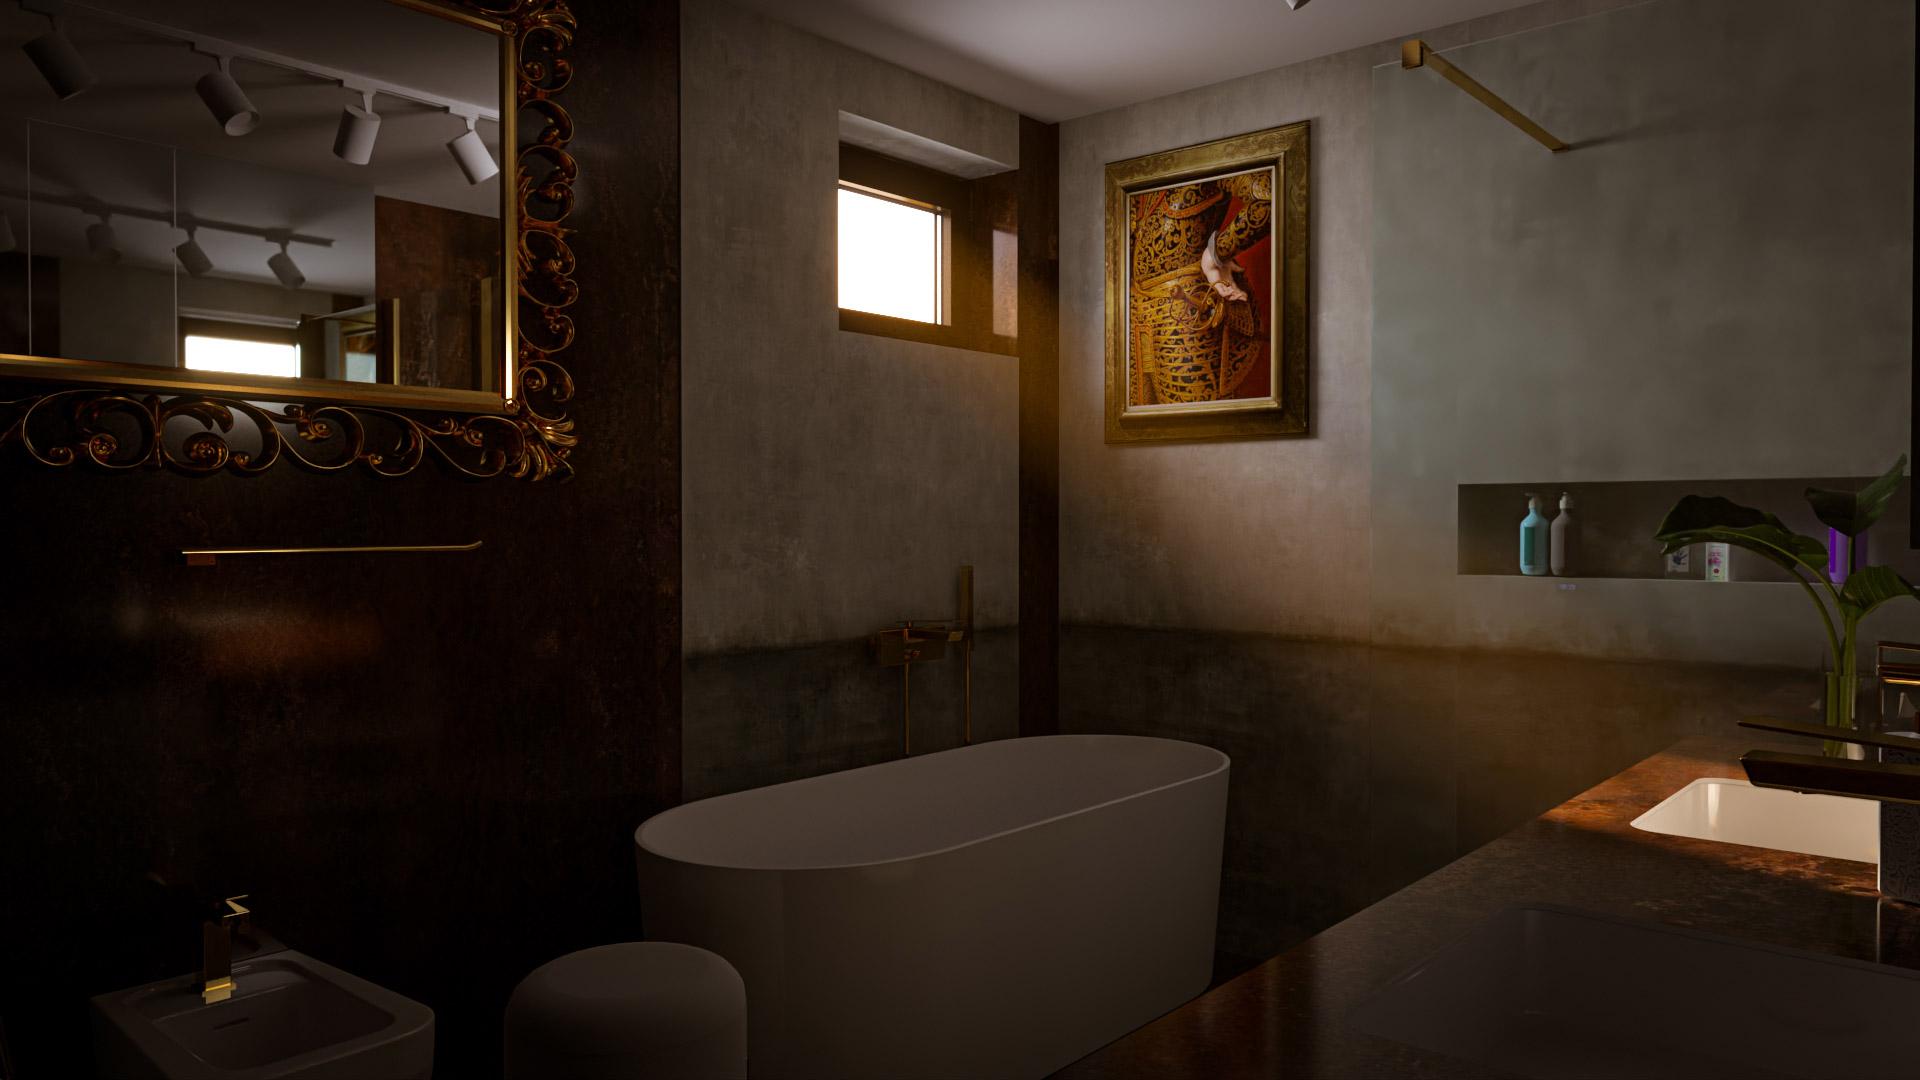 Bathroom visualization - Bitopia 3D rendering studio